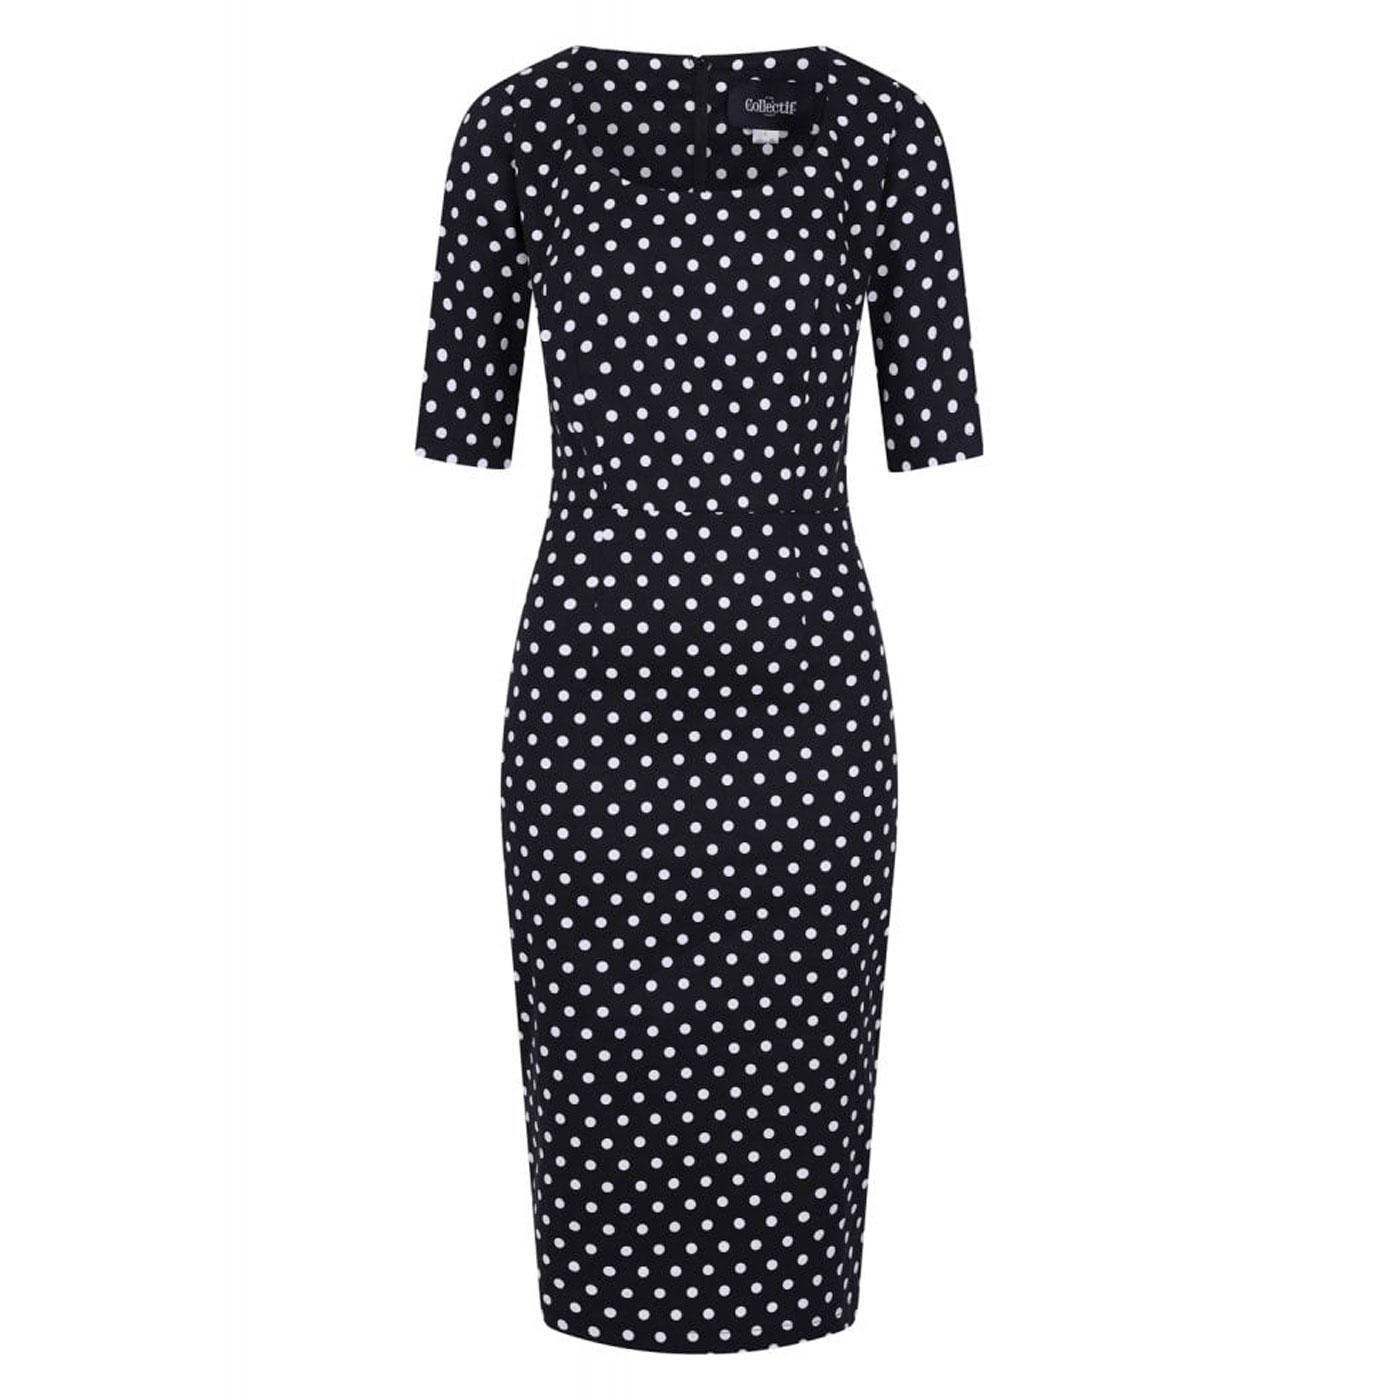 Amber COLLECTIF Polka Dot Pencil Dress In Black